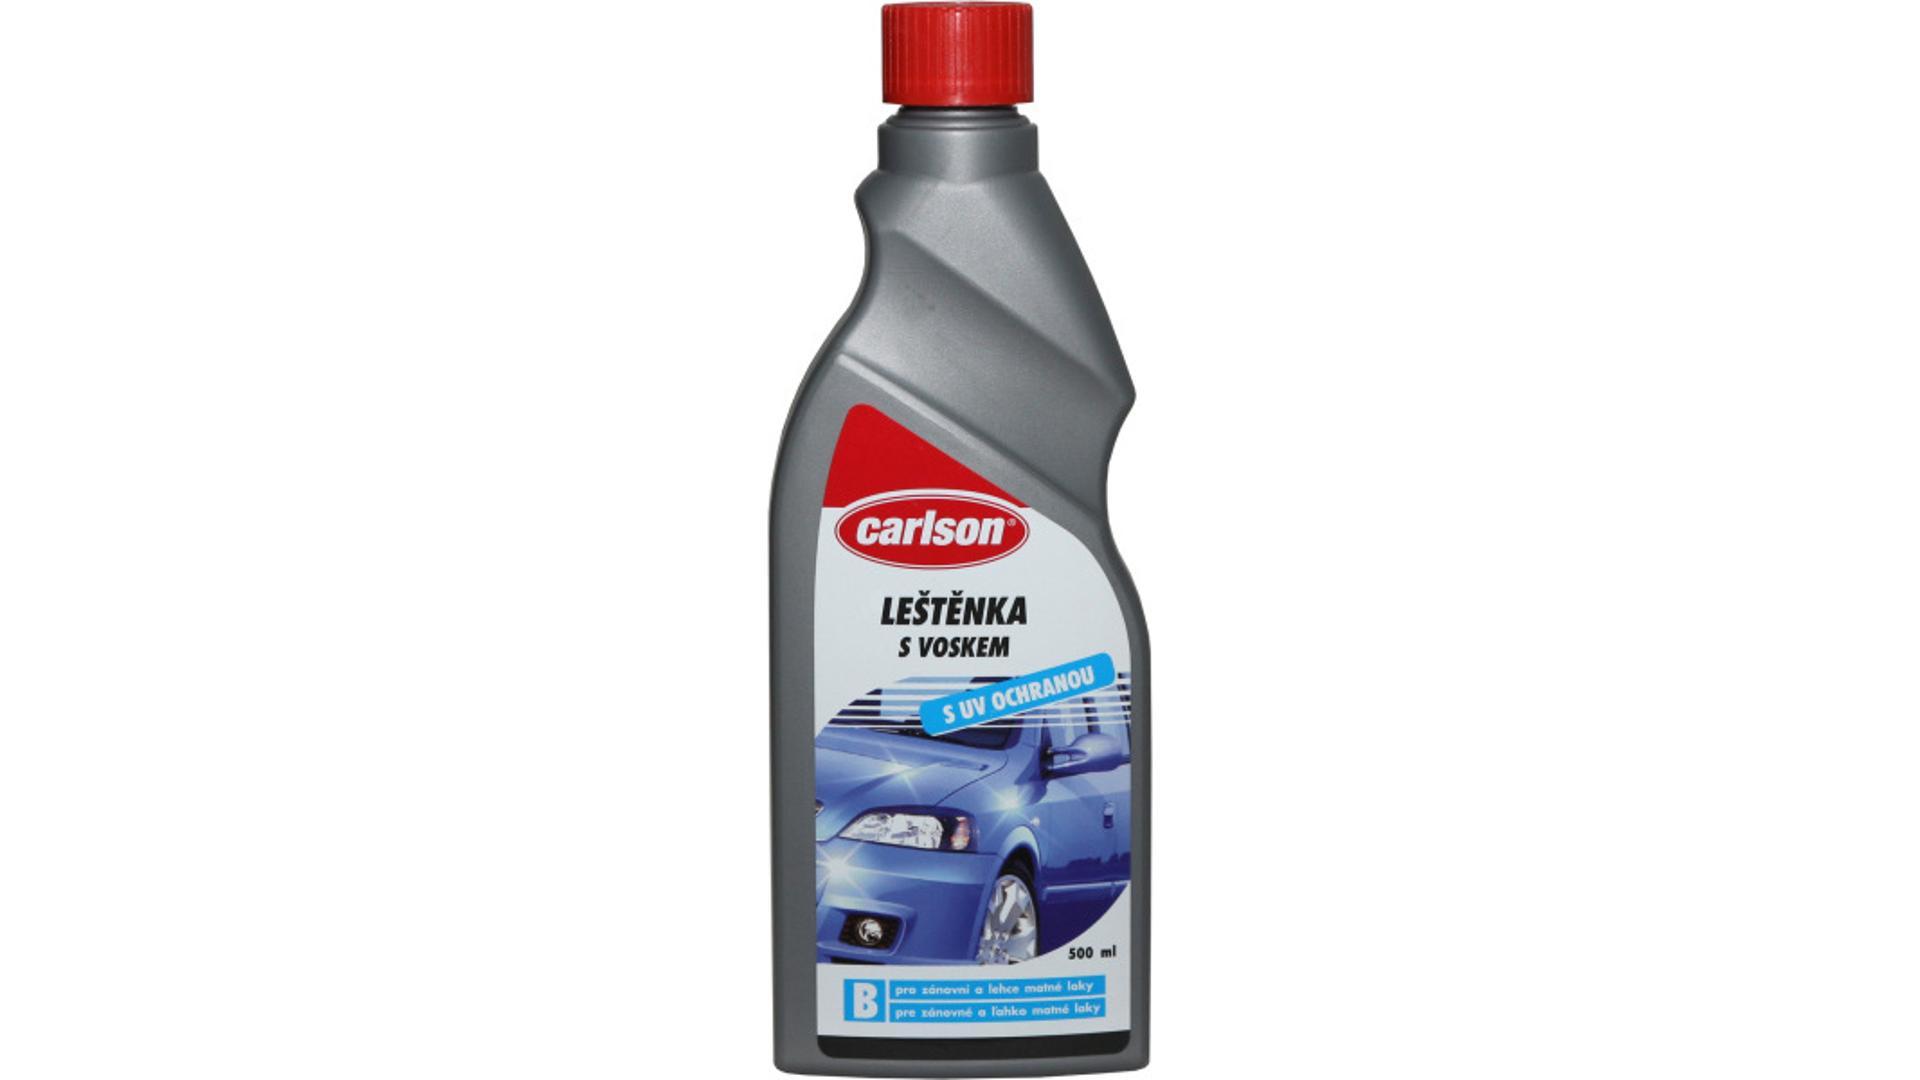 CARLSON AUTOLEŠTĚNKA S VOSKEM 500 ML